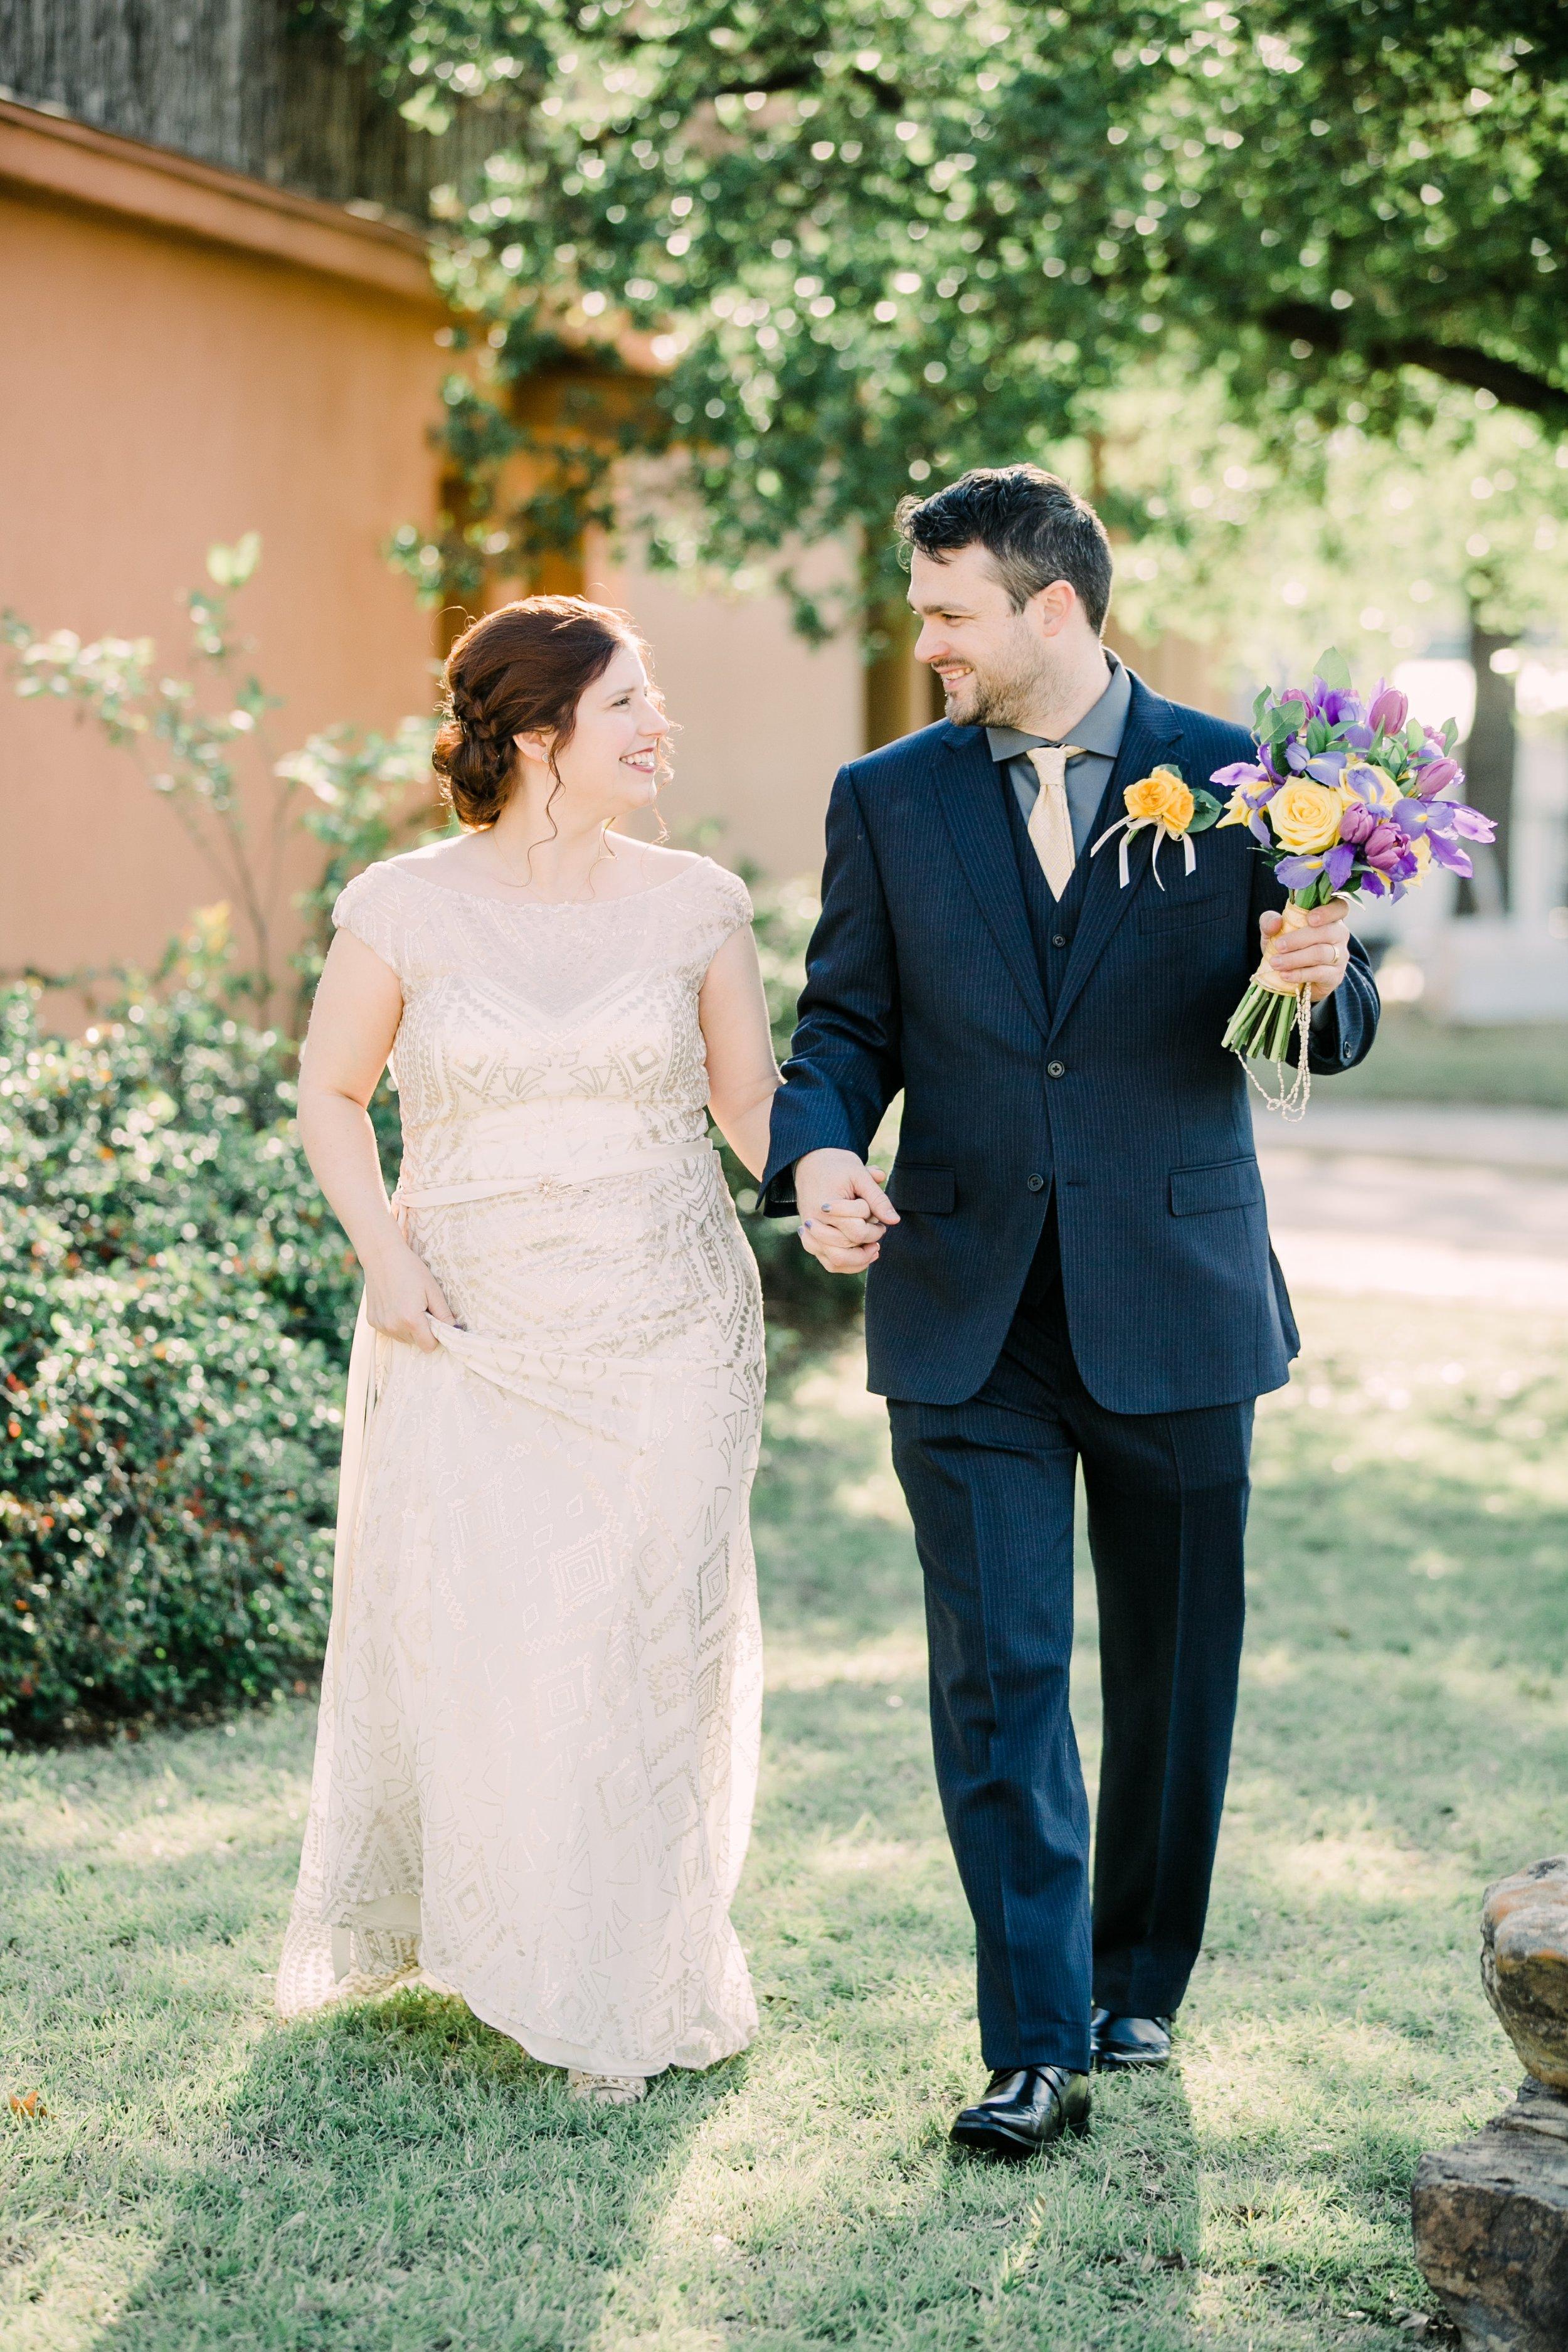 the-rock-barn-henrietta-wedding-photographer-texas-wichita-falls-earth-day-wedding-020.jpg